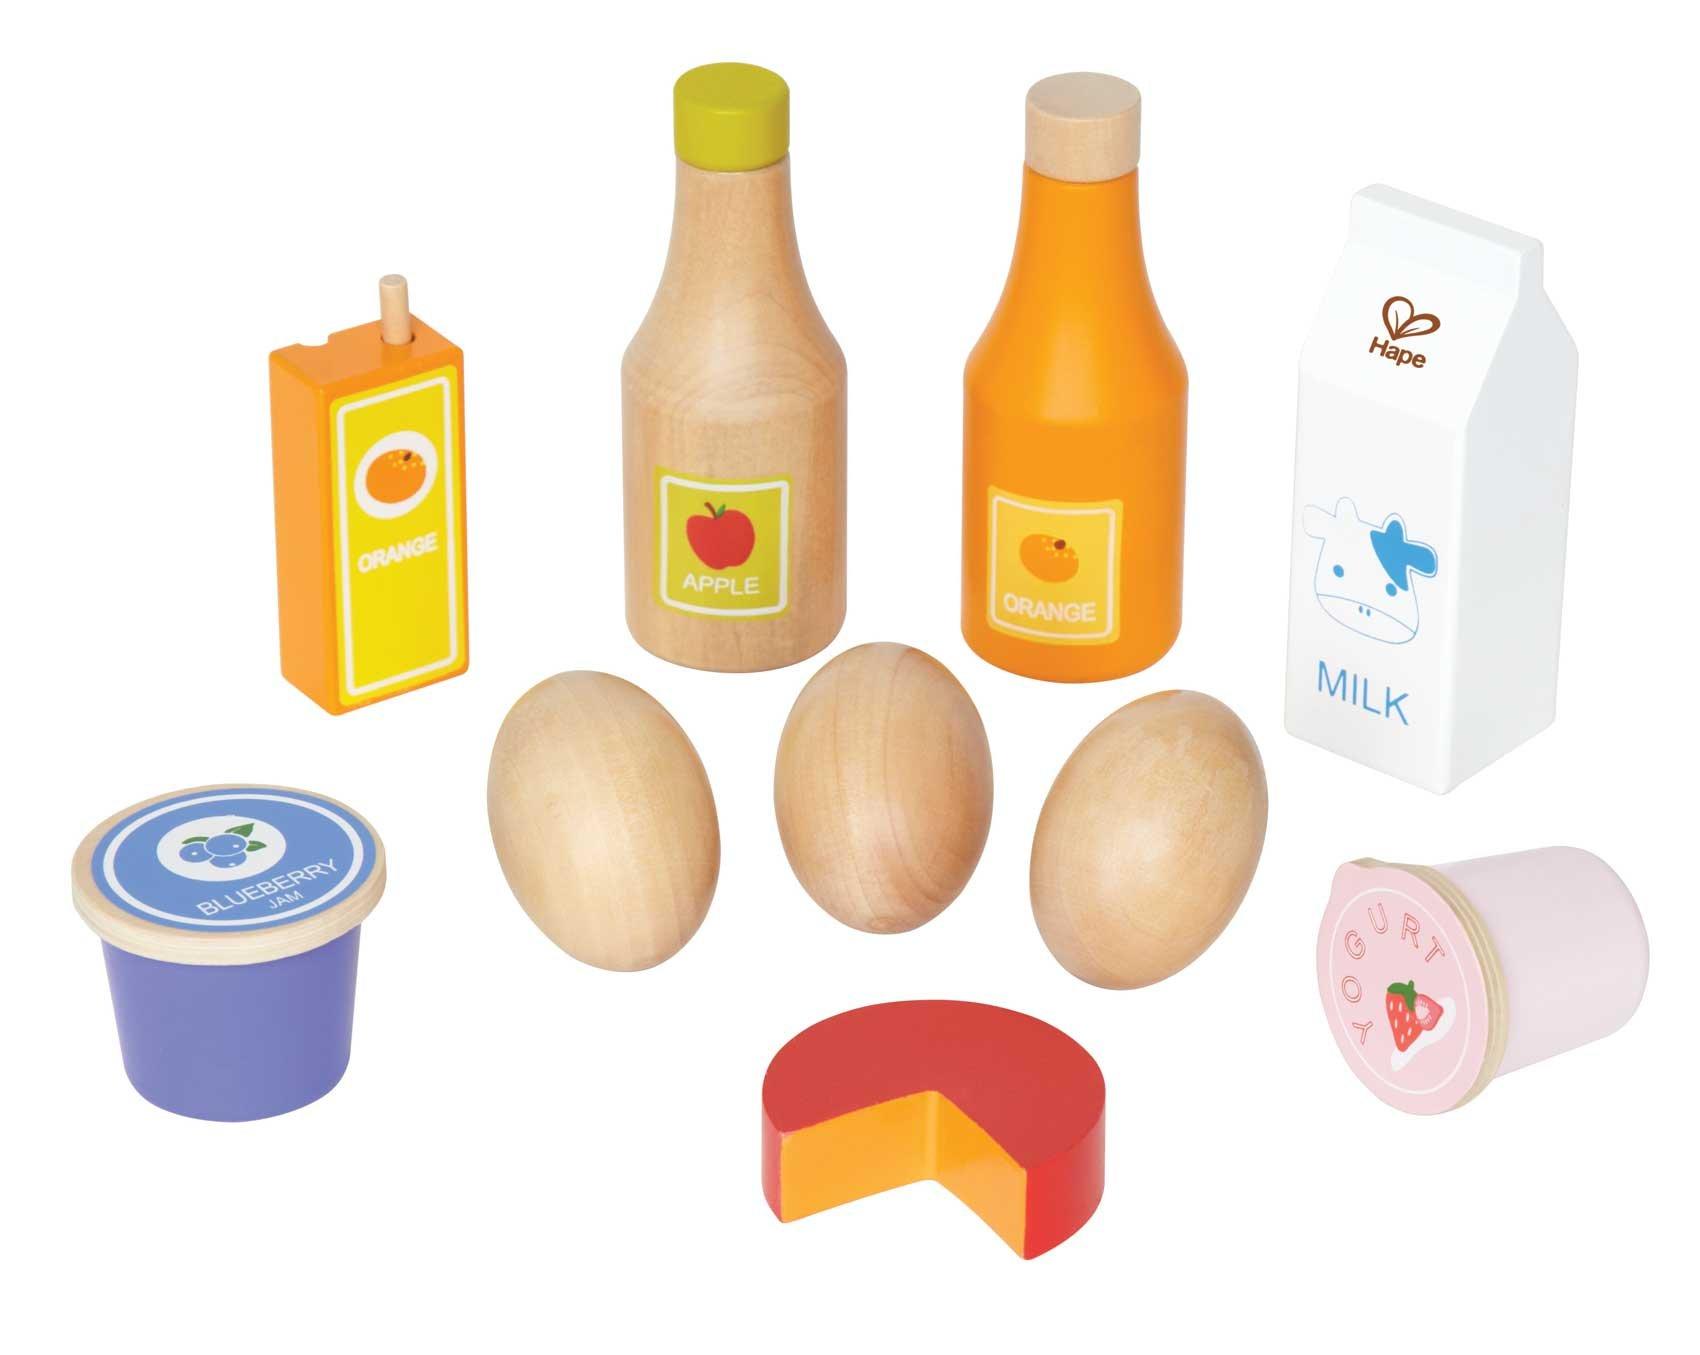 Hape Healthy Basics Kid's Wooden Play Kitchen Accessories Food Set